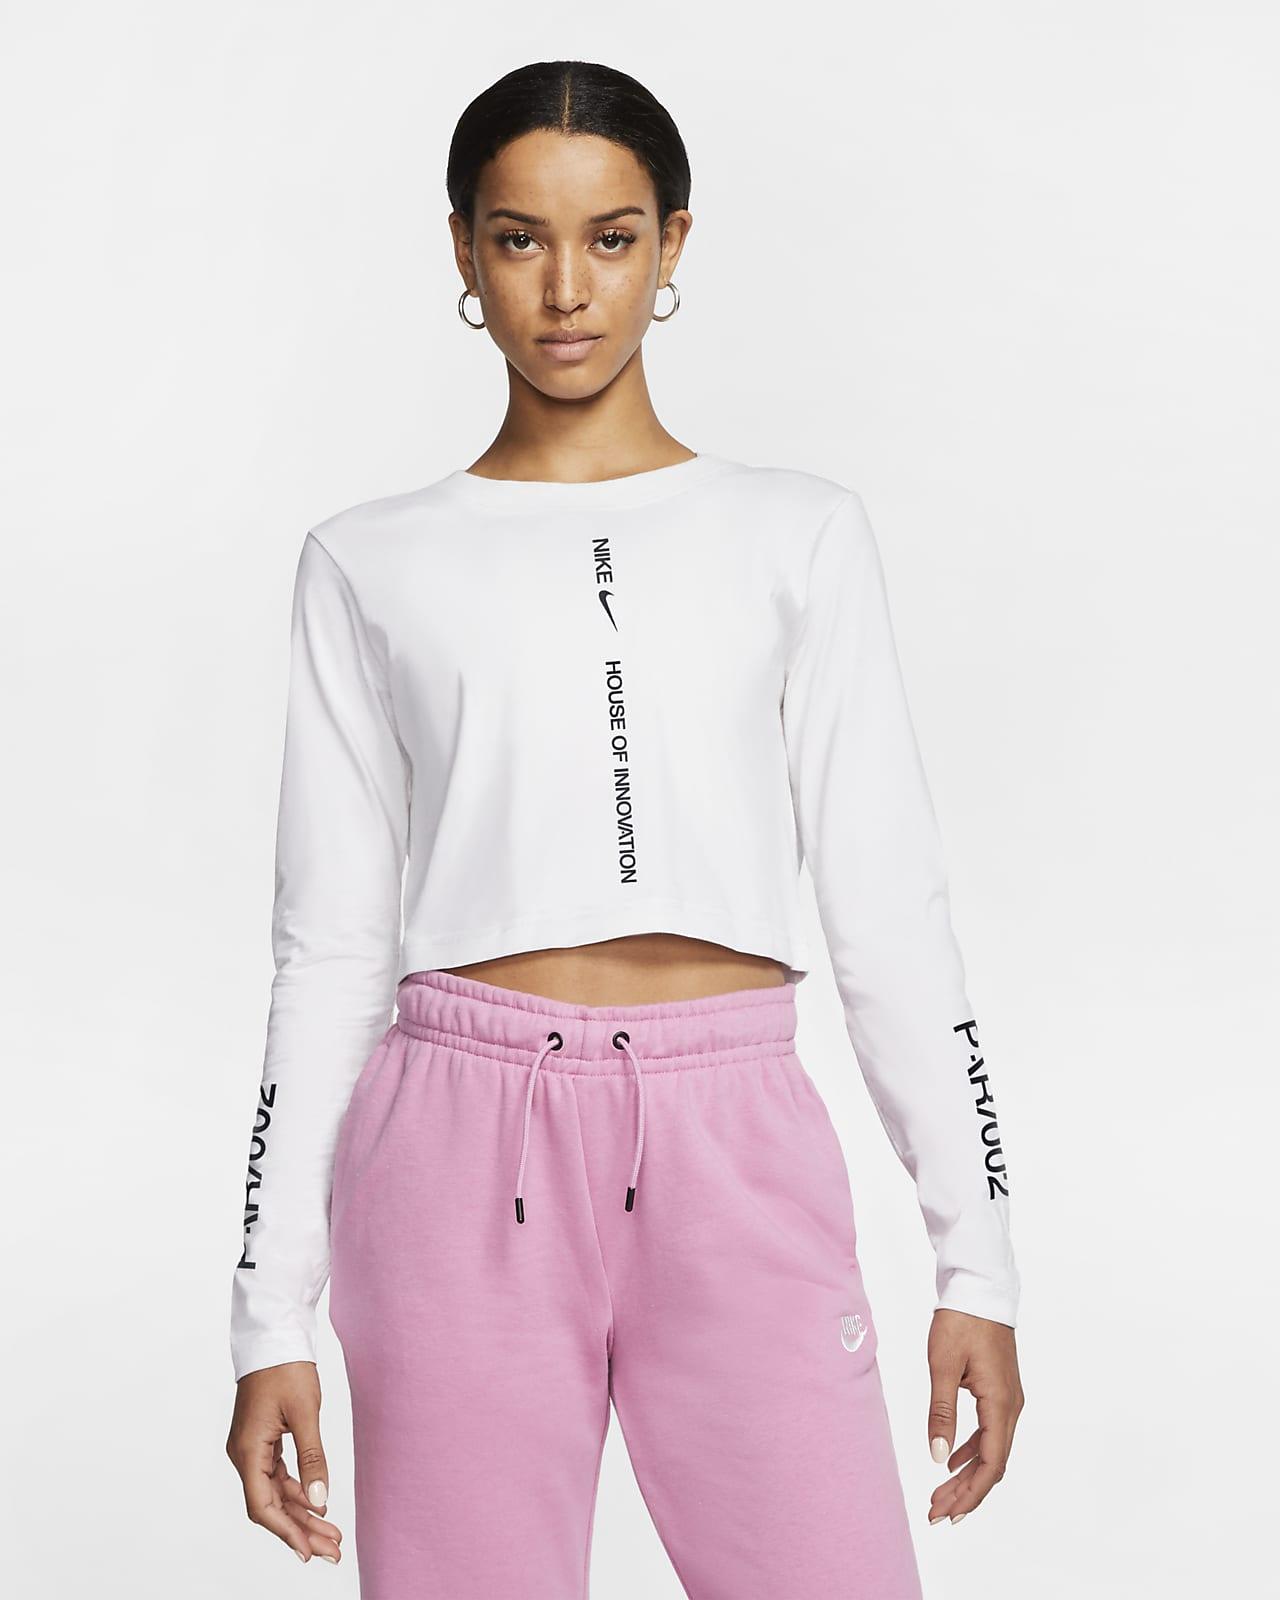 Nike Sportswear House of Innovation (Paris) Camiseta corta de manga larga - Mujer